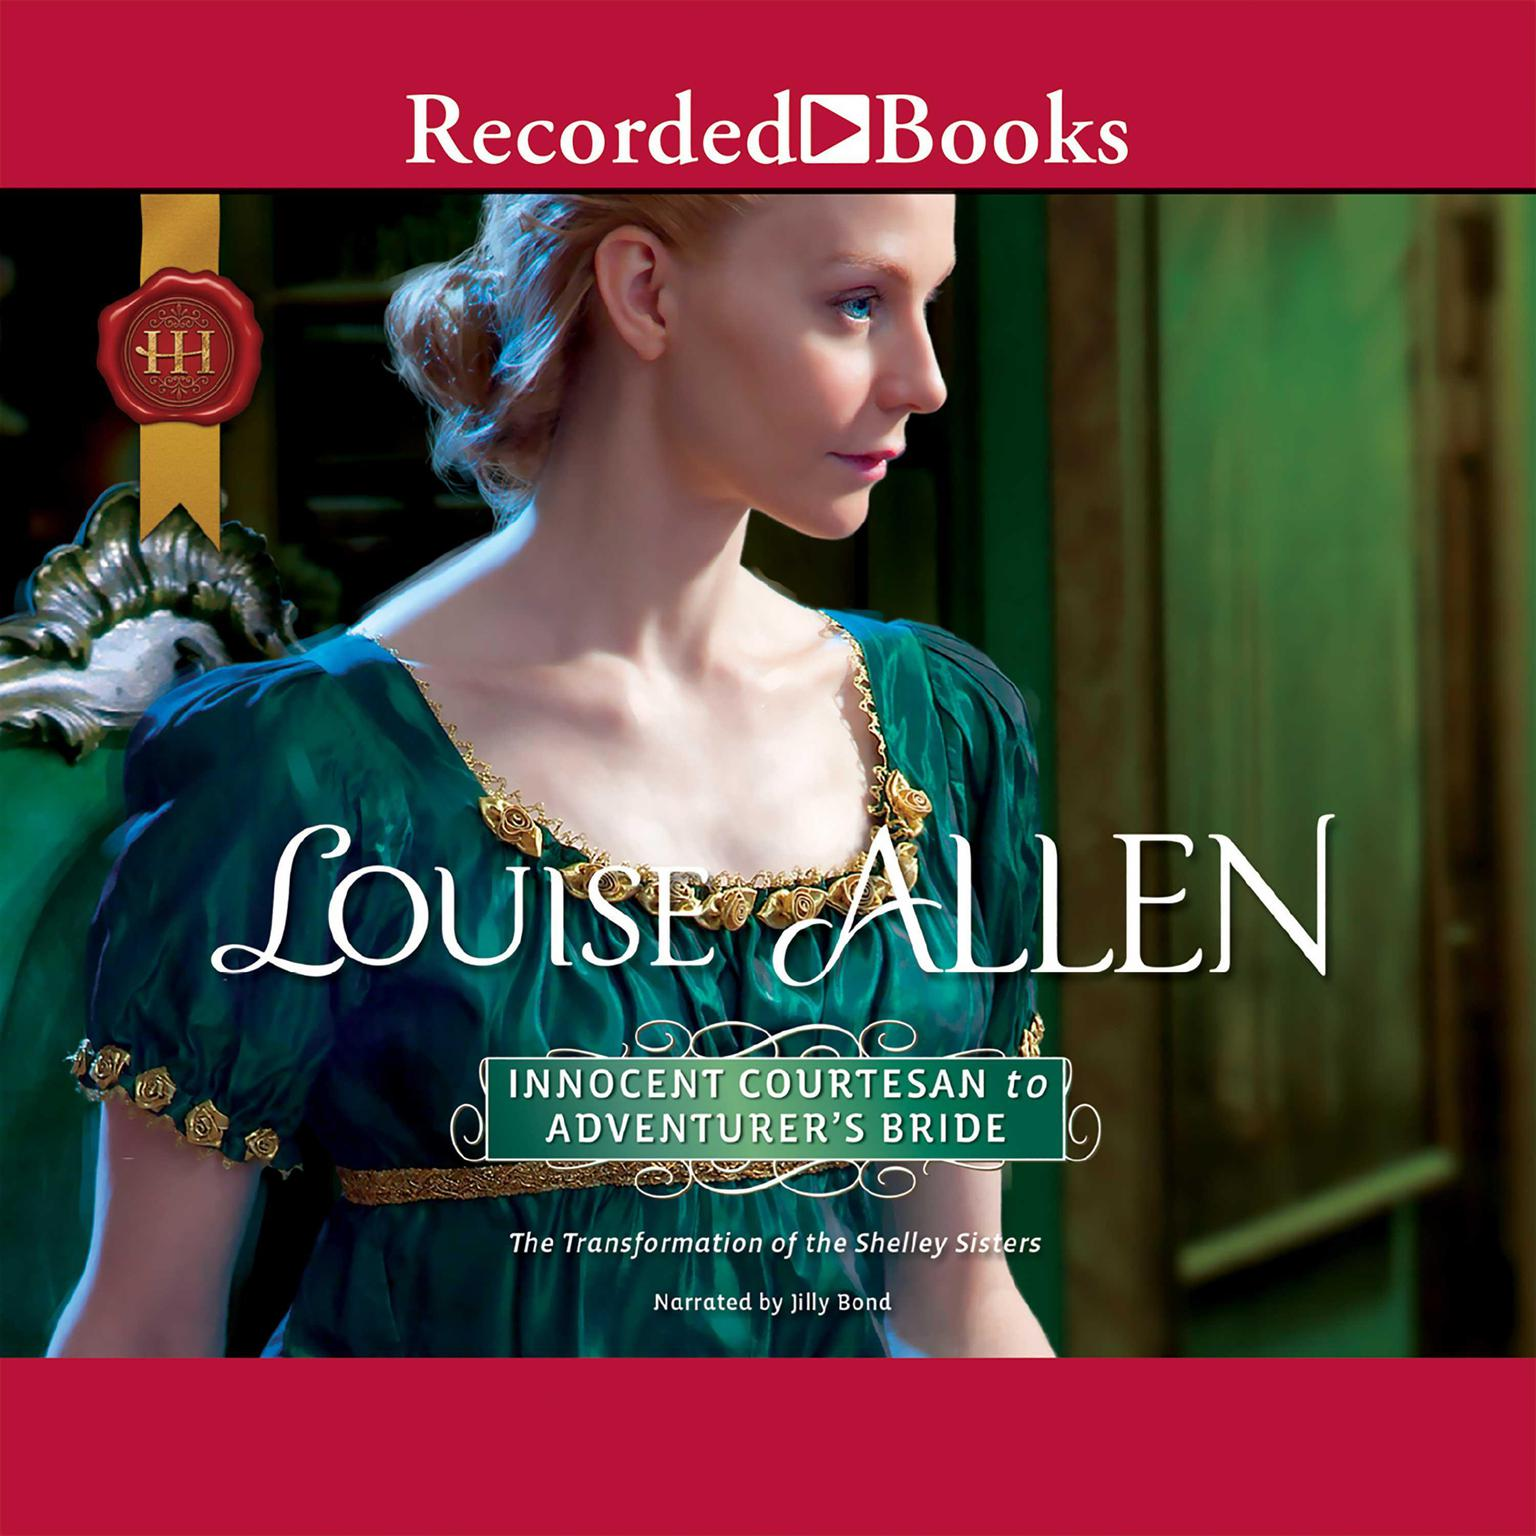 Innocent Courtesan to Adventurers Bride Audiobook, by Louise Allen